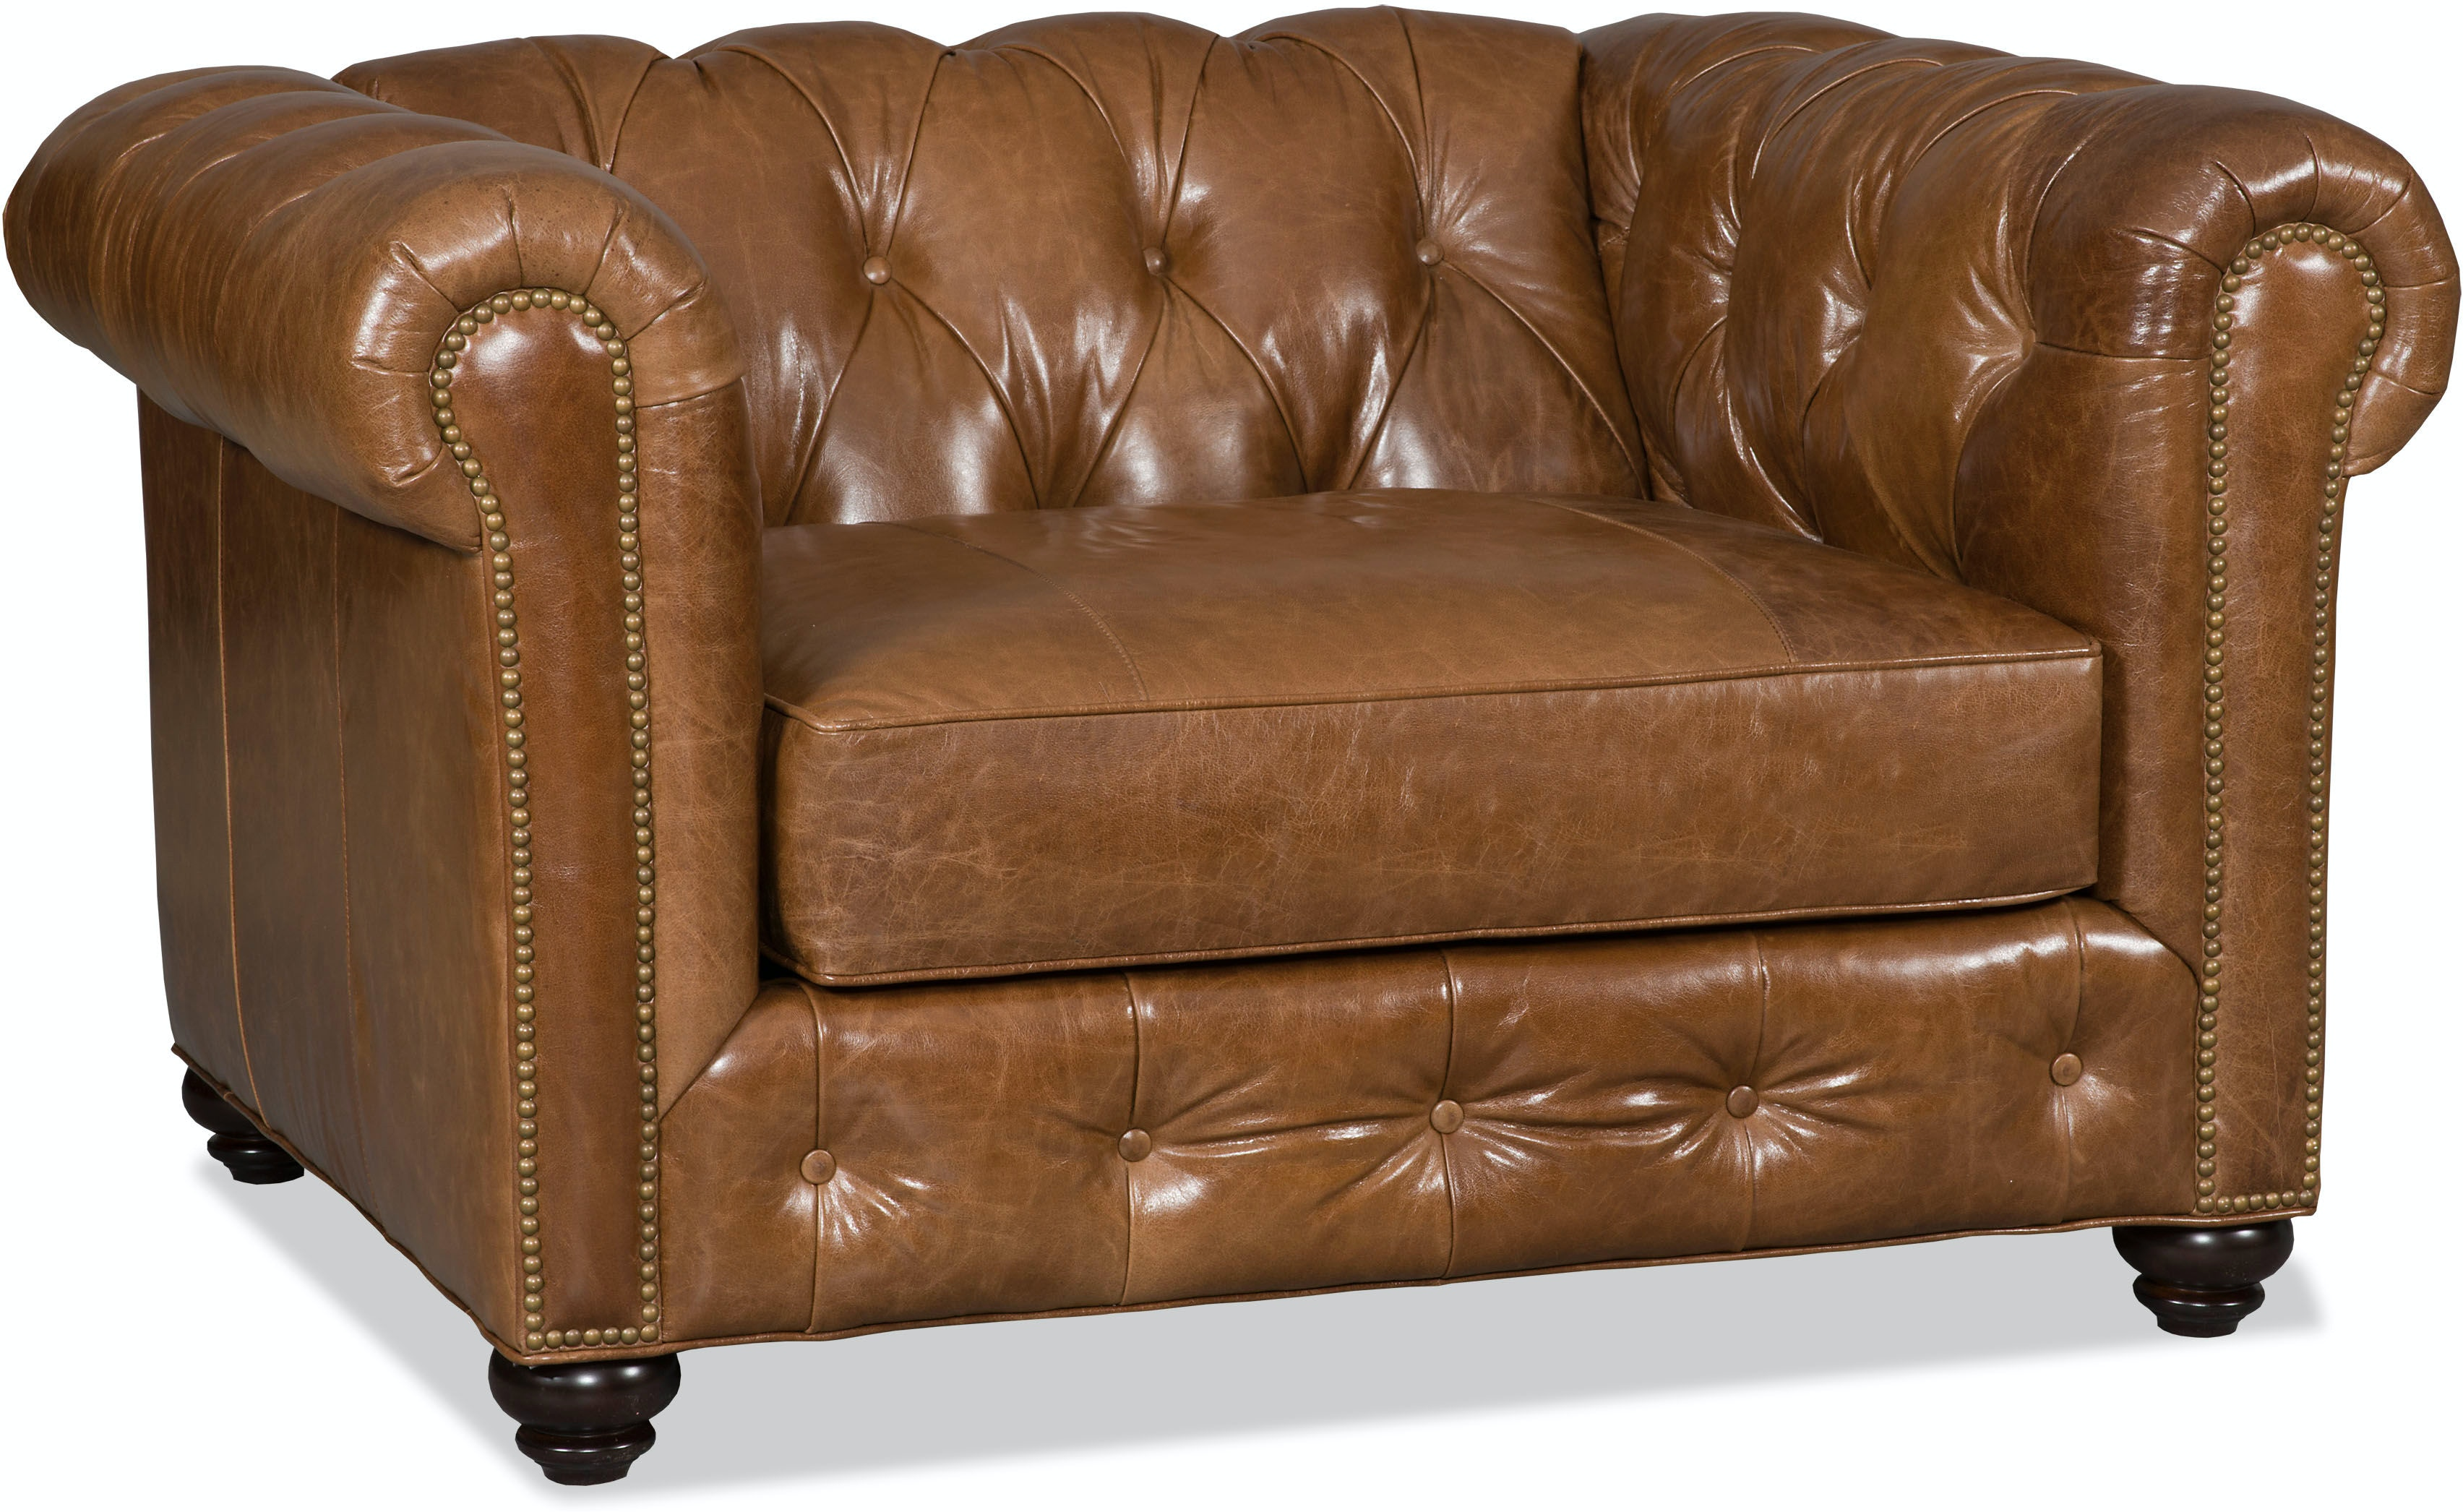 Bradington young furniture 698 45 living room wellington for Furniture wellington